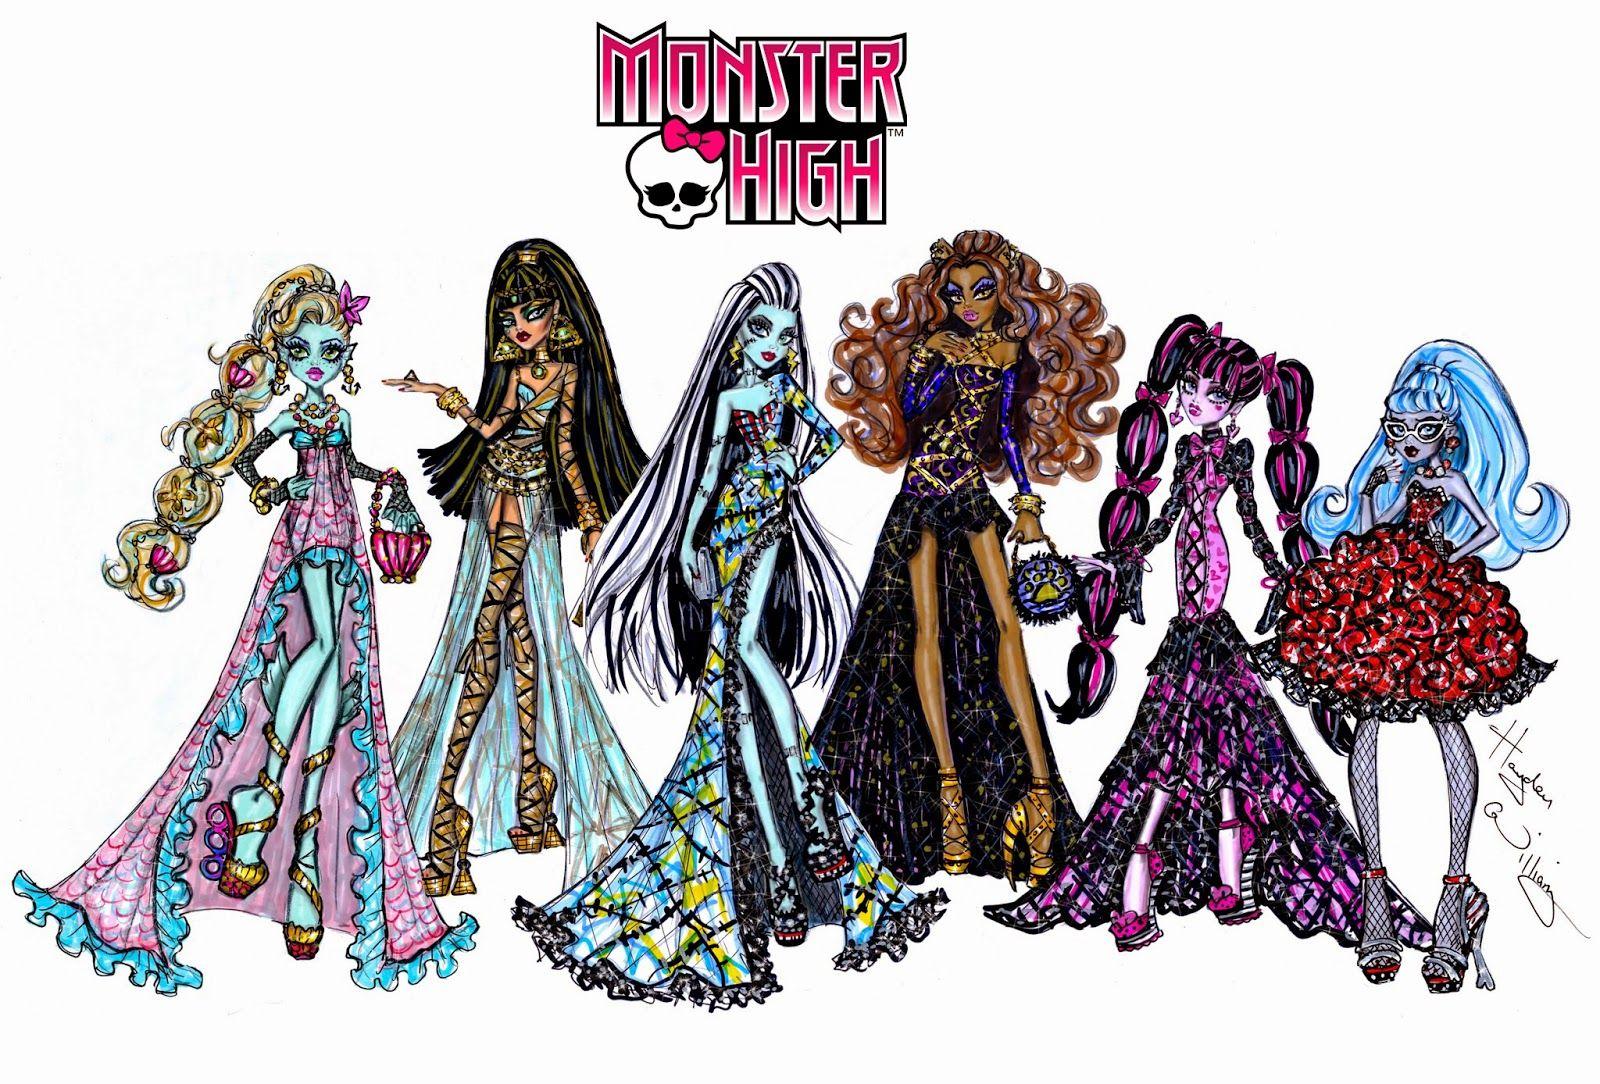 #Hayden Williams Fashion Illustrations #Monster High by Hayden Williams